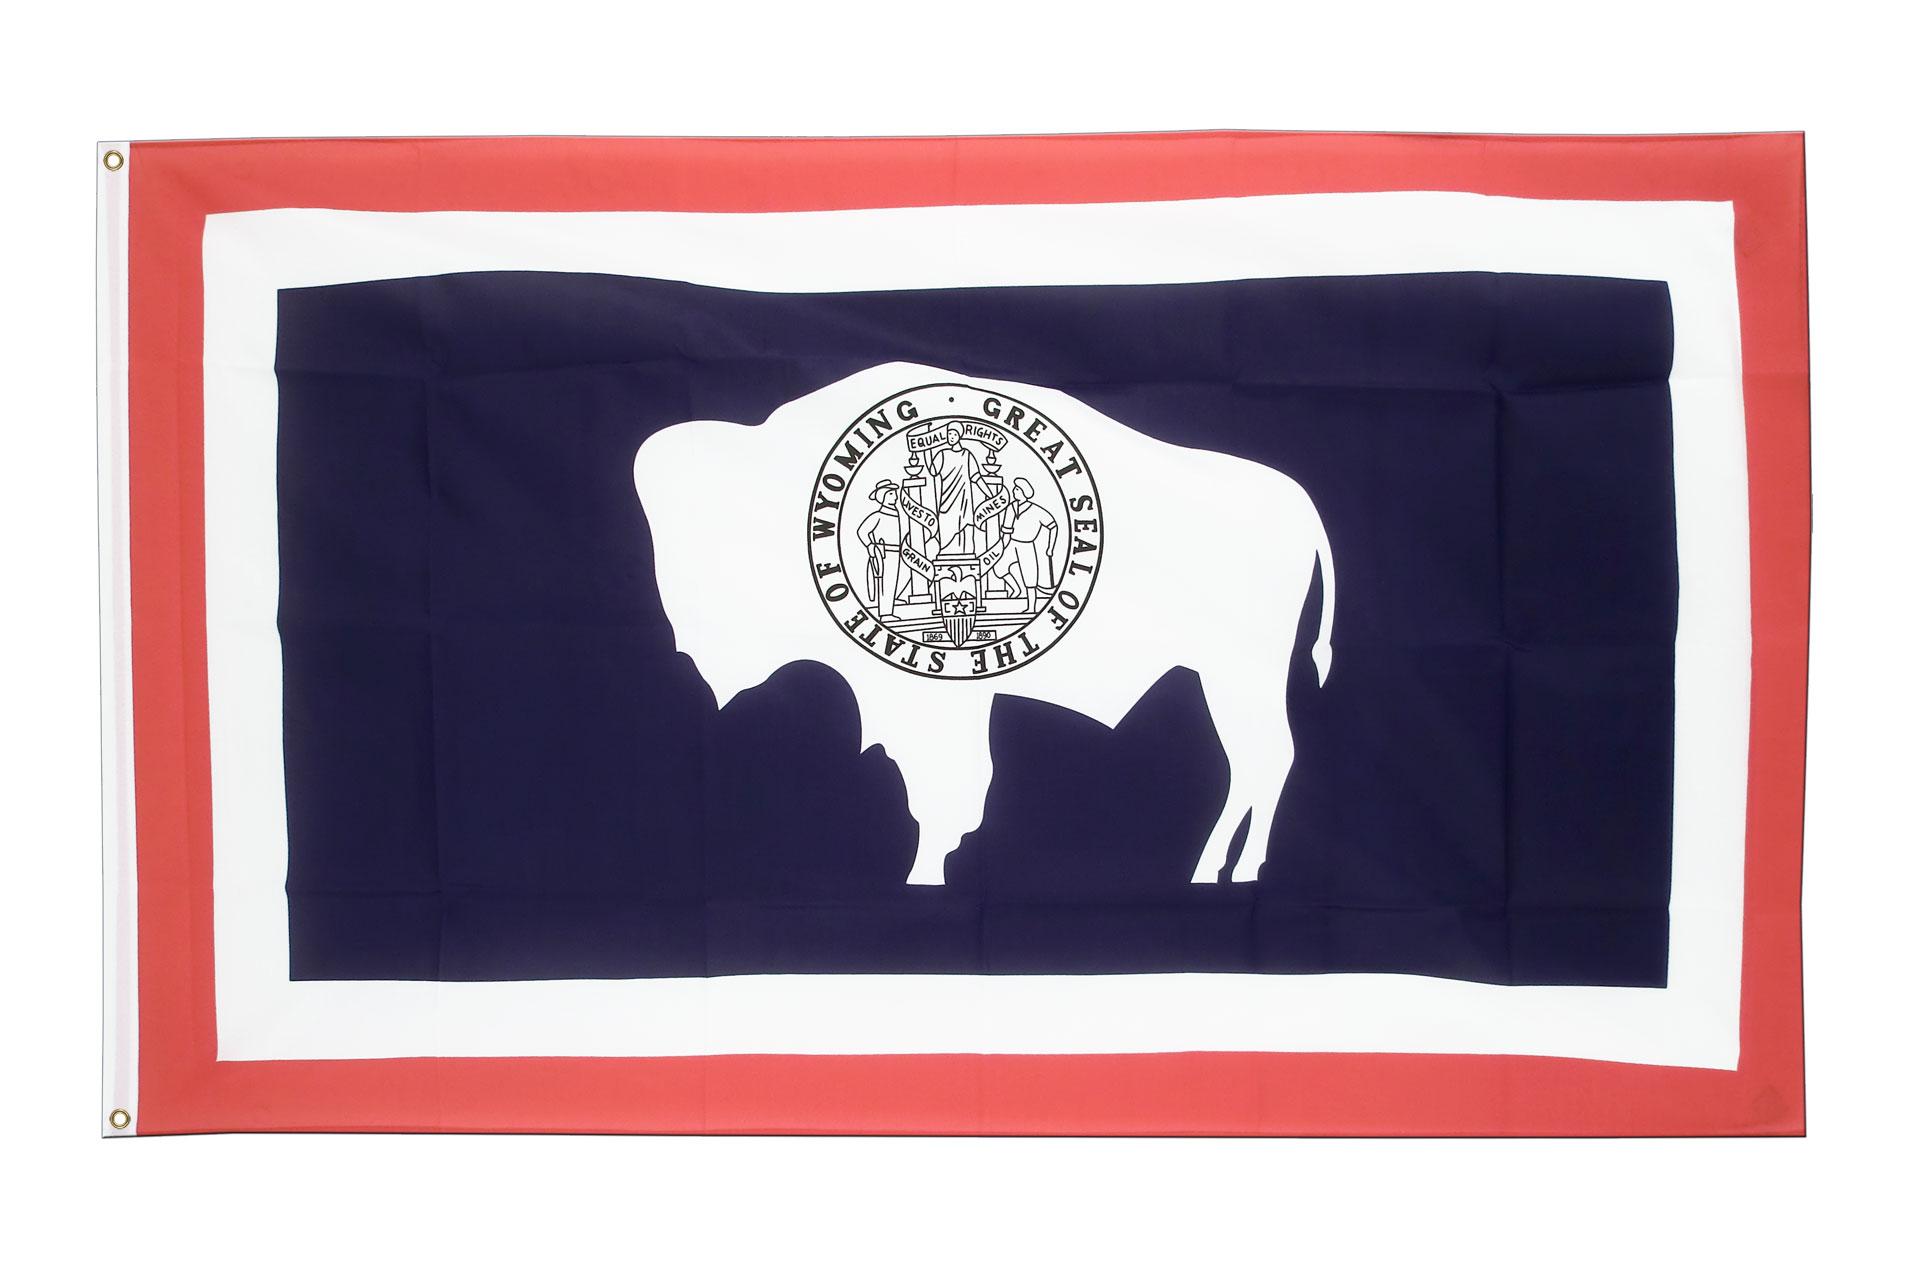 Buy Wyoming Flag - 3x5 ft (90x150 cm) - Royal-Flags: https://www.royal-flags.co.uk/wyoming-flag-2176.html